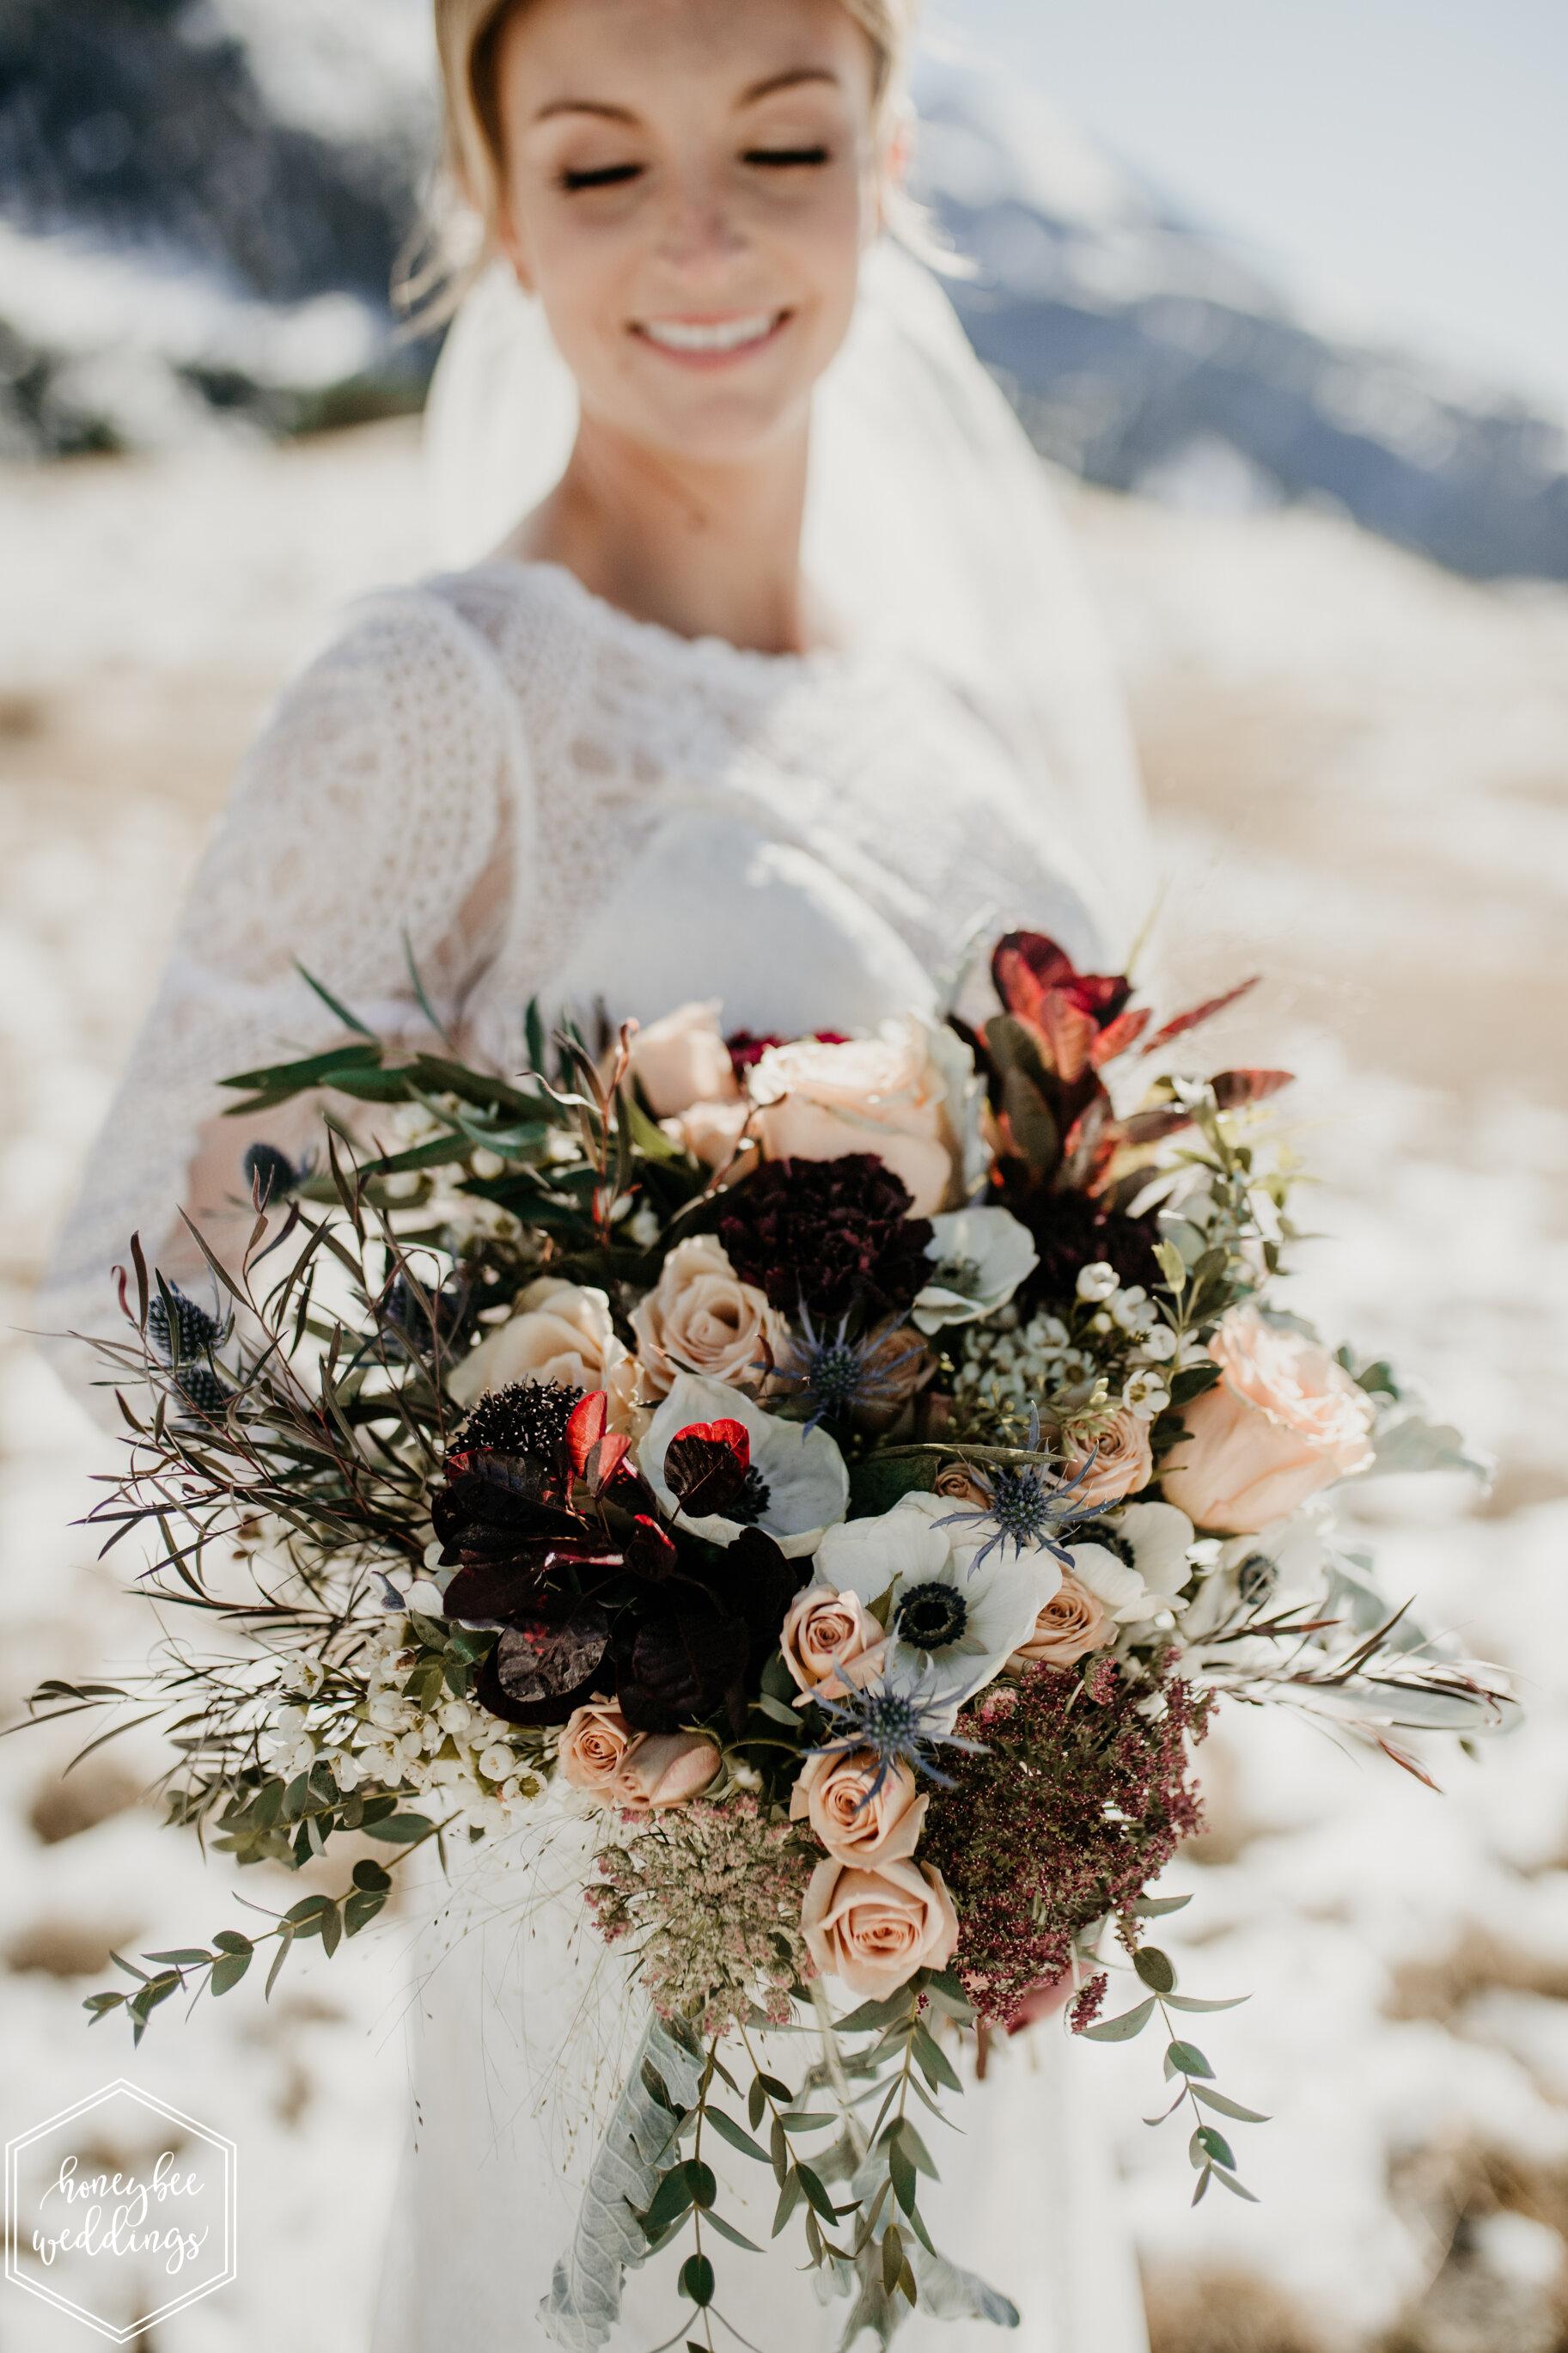 067Chico Hot Springs Wedding_Montana Wedding Photographer_Winter Wedding_Ariel & Richard_October 12, 2019-1222.jpg